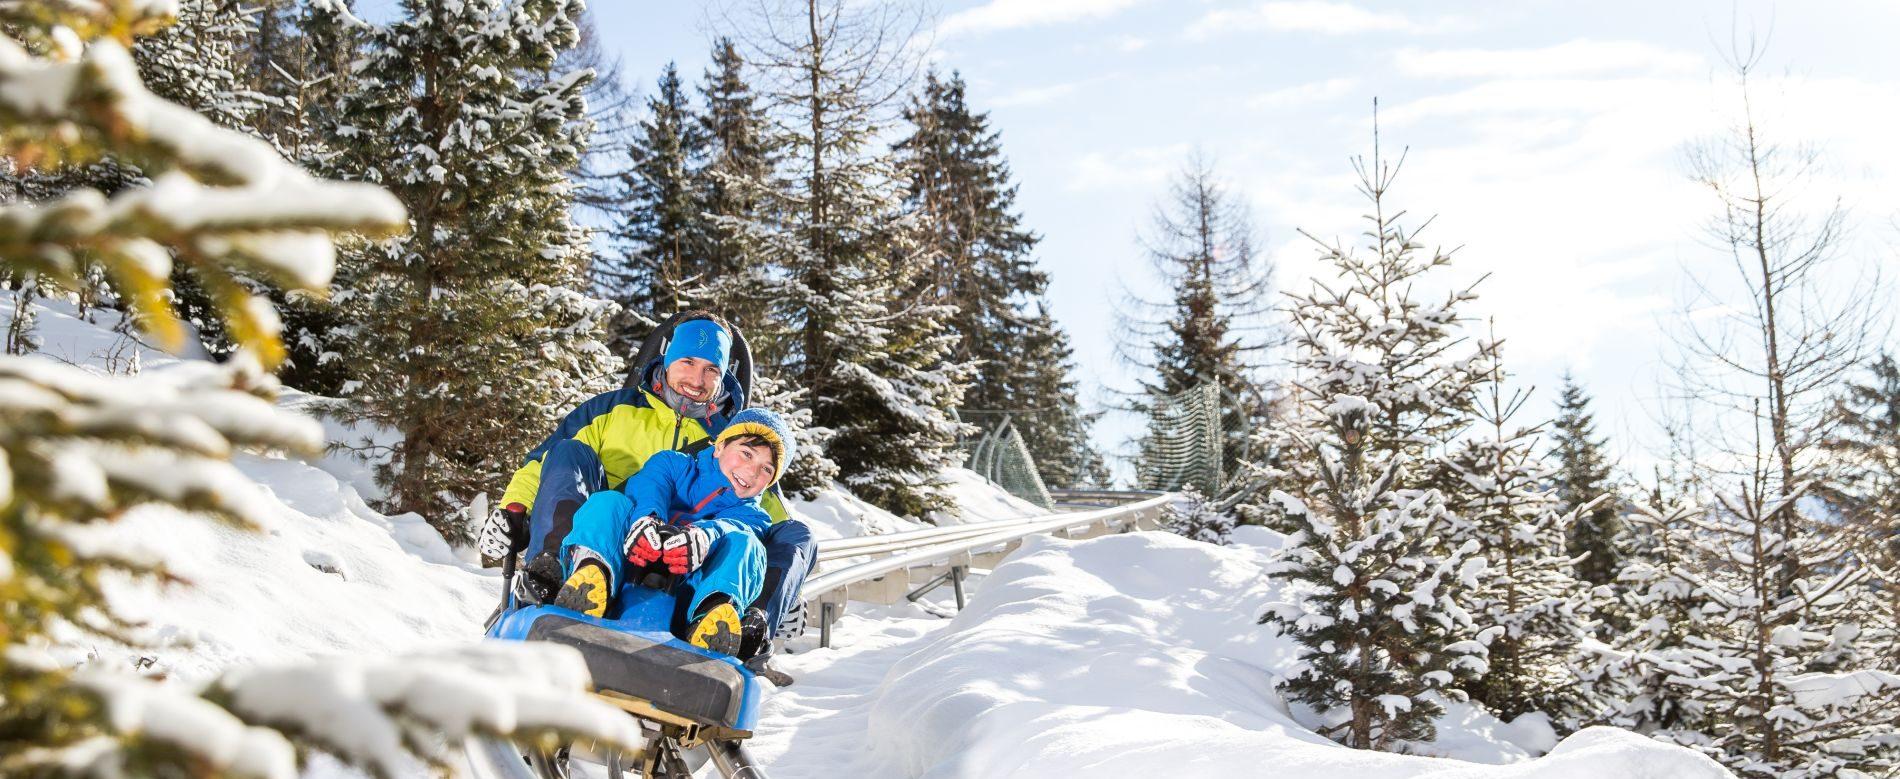 alpine-coaster-gardonè-inverno-ski-center-latemar-val-di-fiemme-trentino